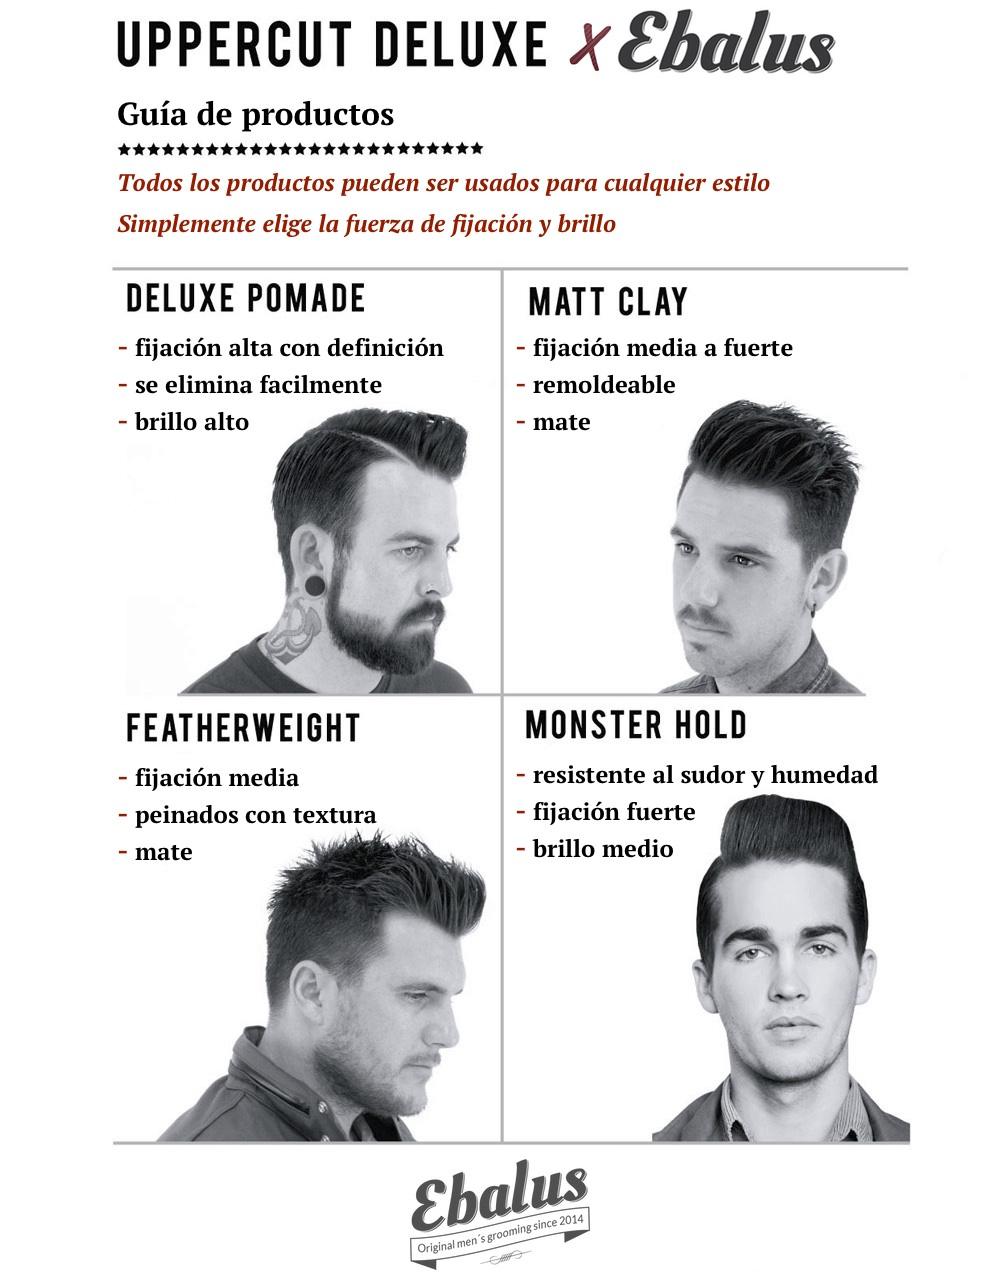 Guía de fijadores para pelo de Uppercut Deluxe